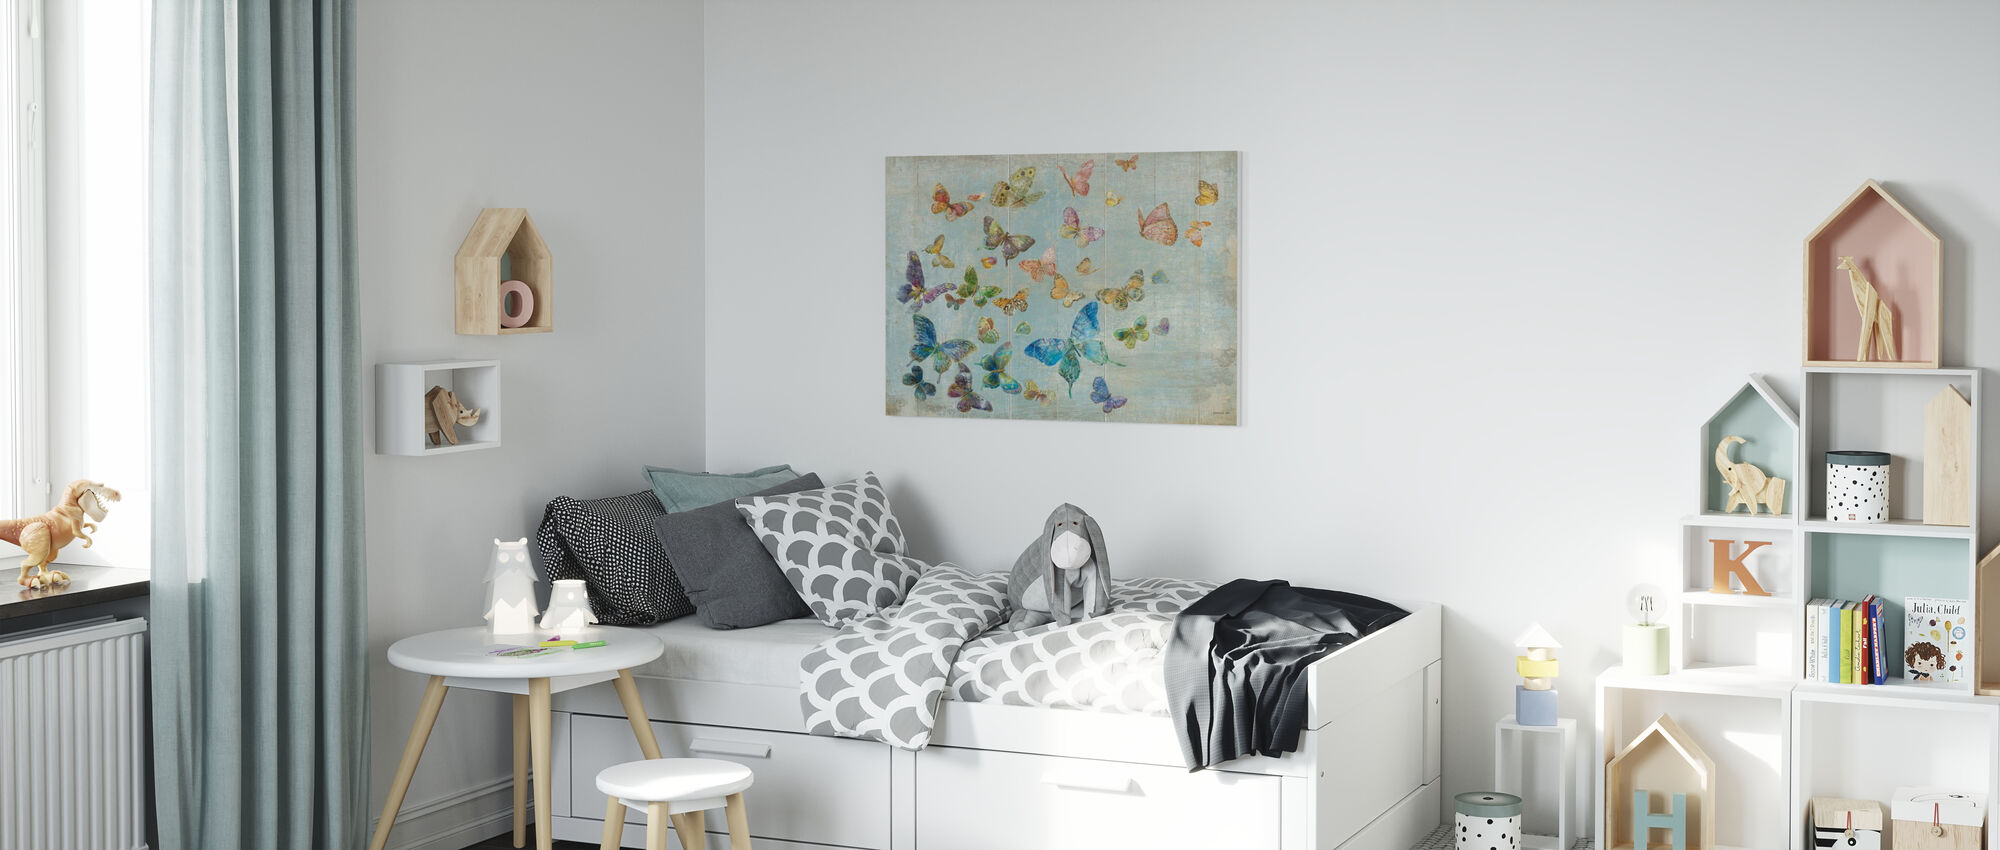 Perhosia - Canvastaulu - Lastenhuone